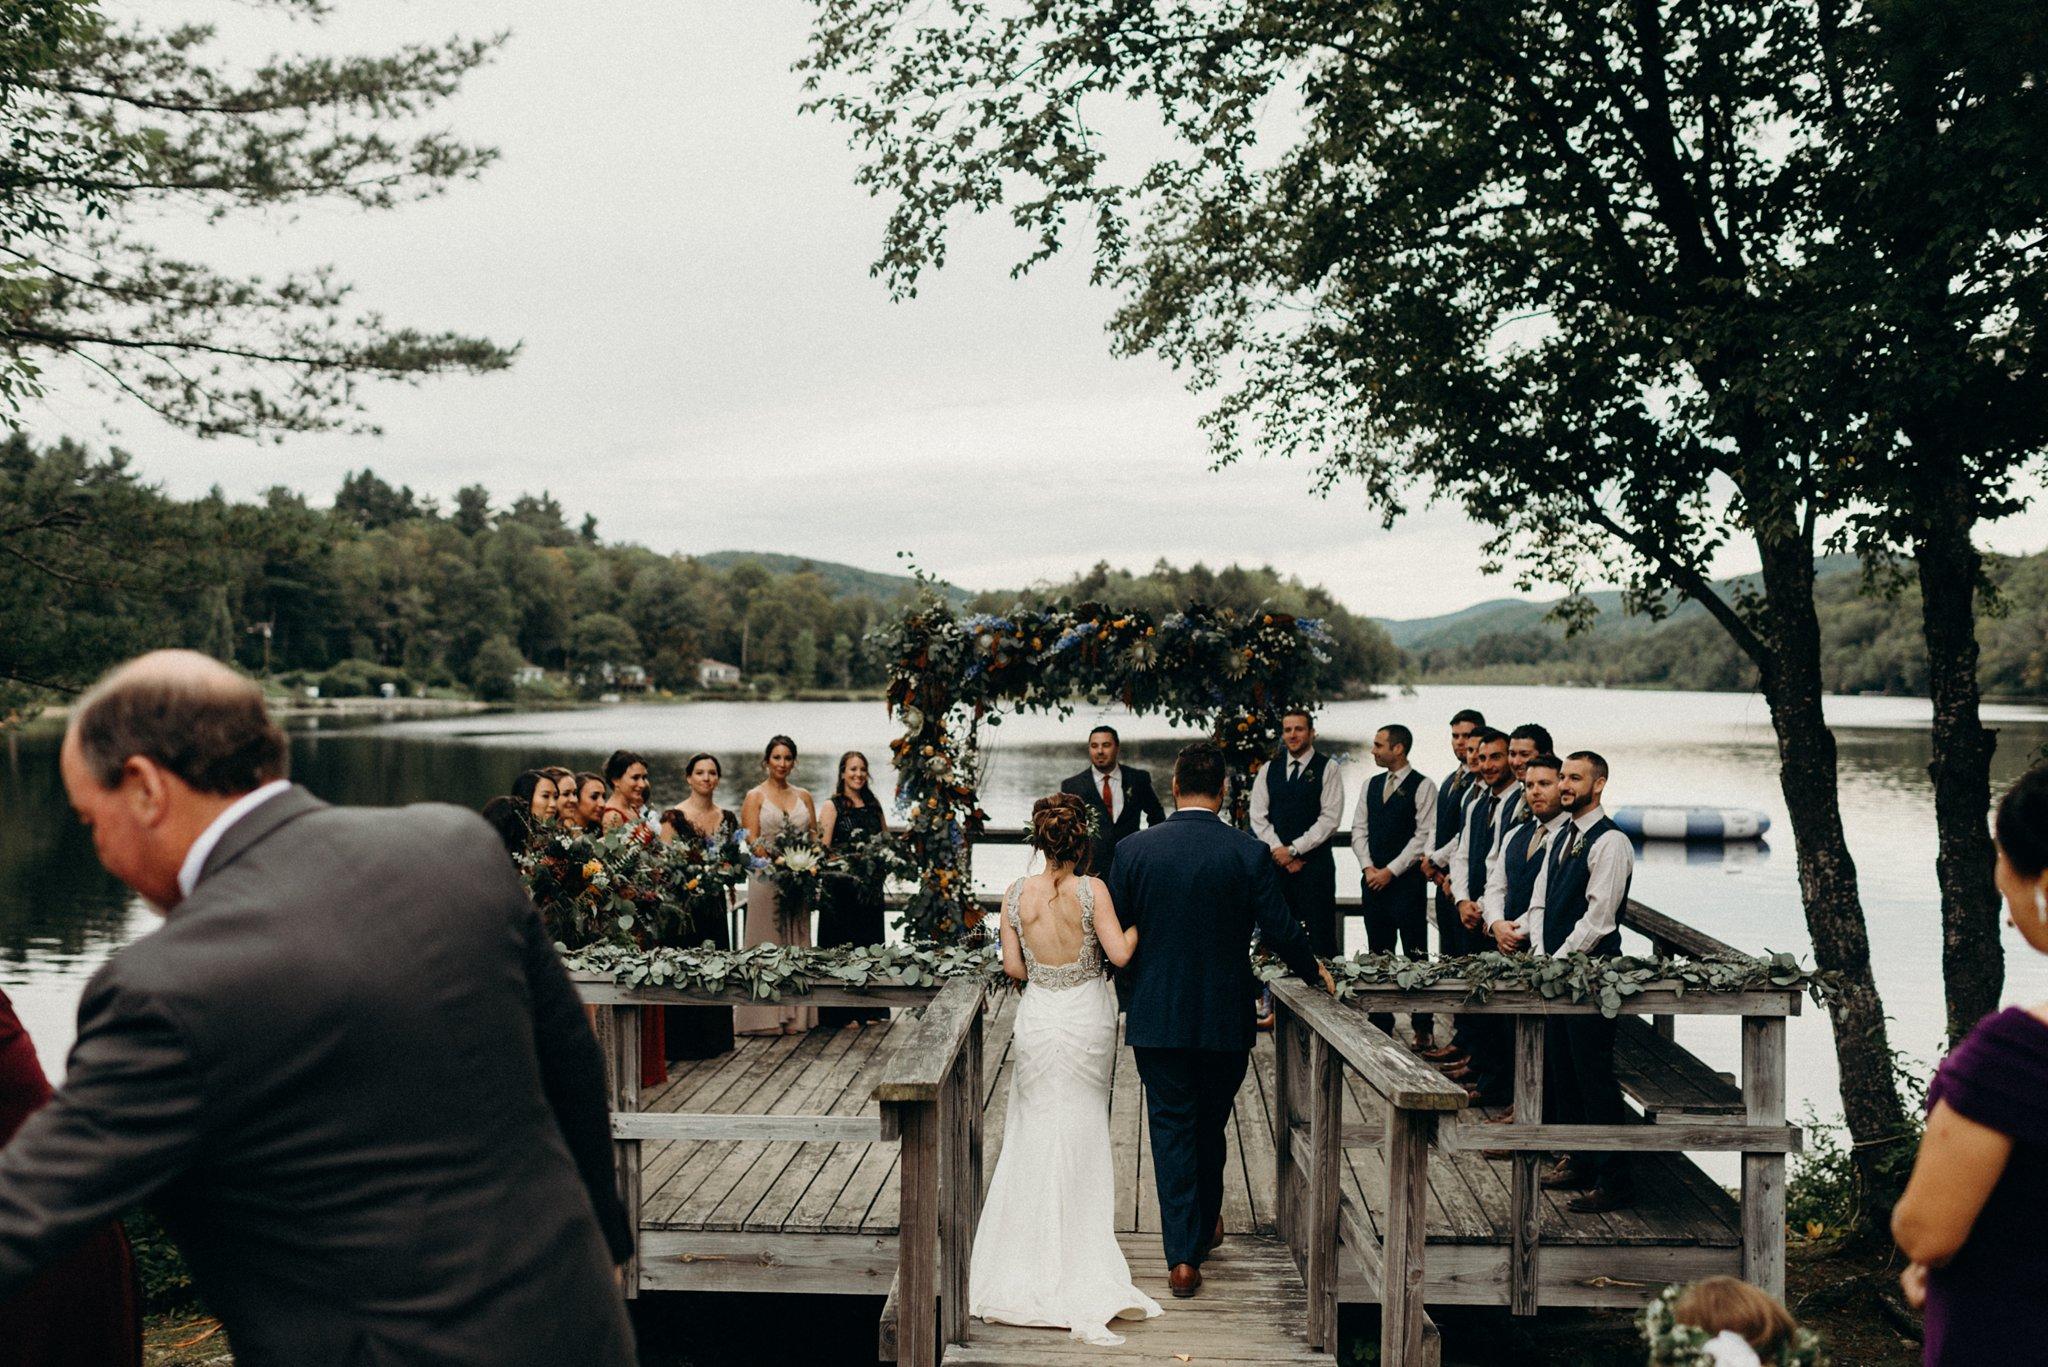 kaihla_tonai_intimate_wedding_elopement_photographer_6626.jpg